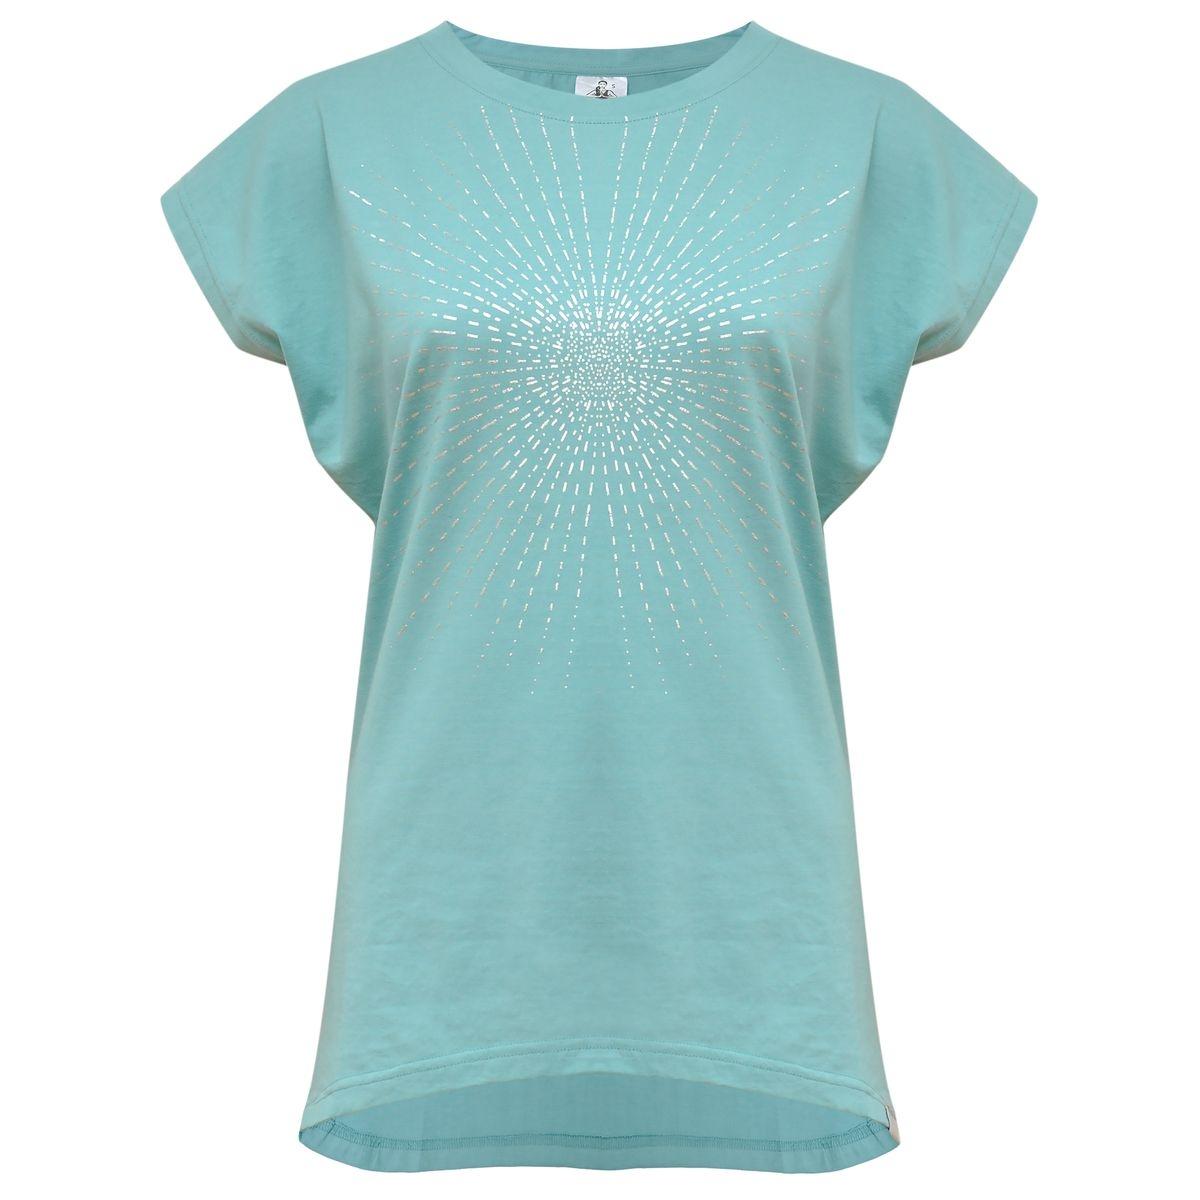 Yoga-T-Shirt  Batwing sunray  - mint/silver Türkis